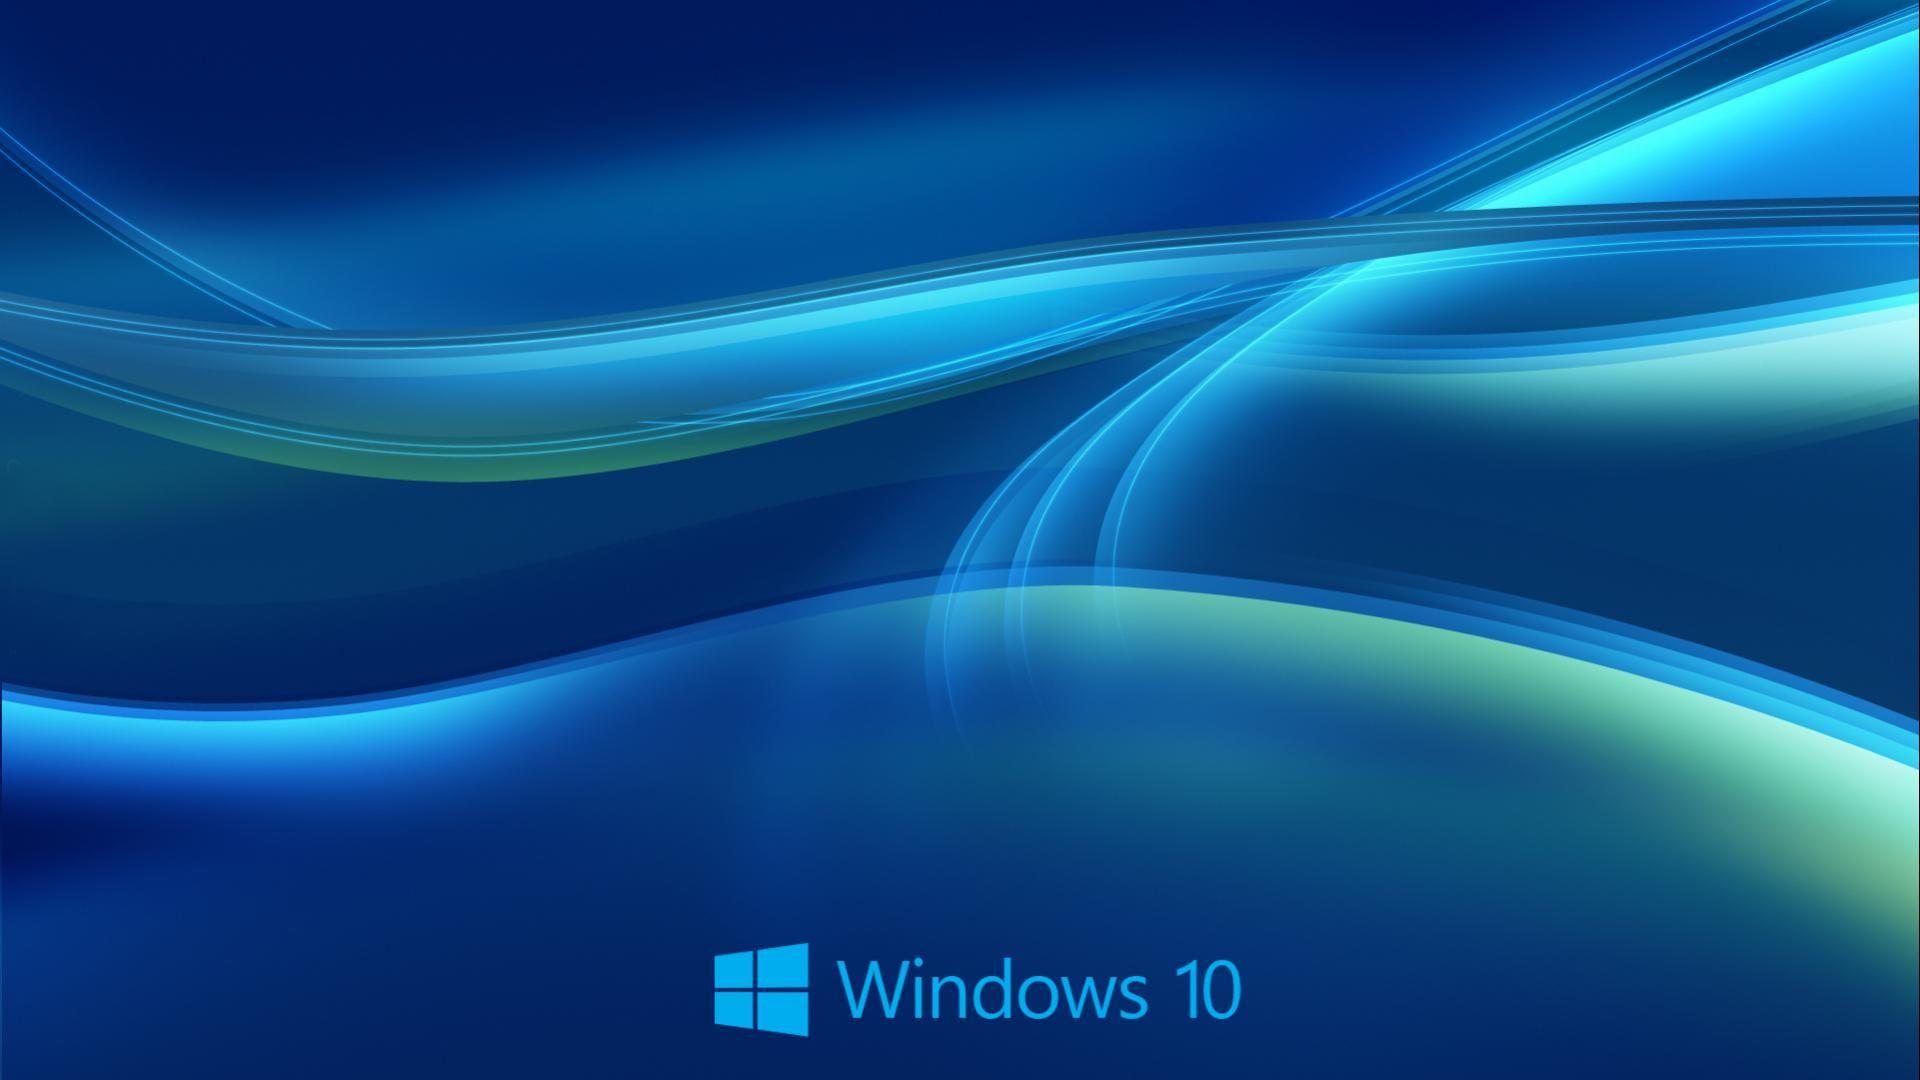 Wallpaper For Windows 10 1920x1080